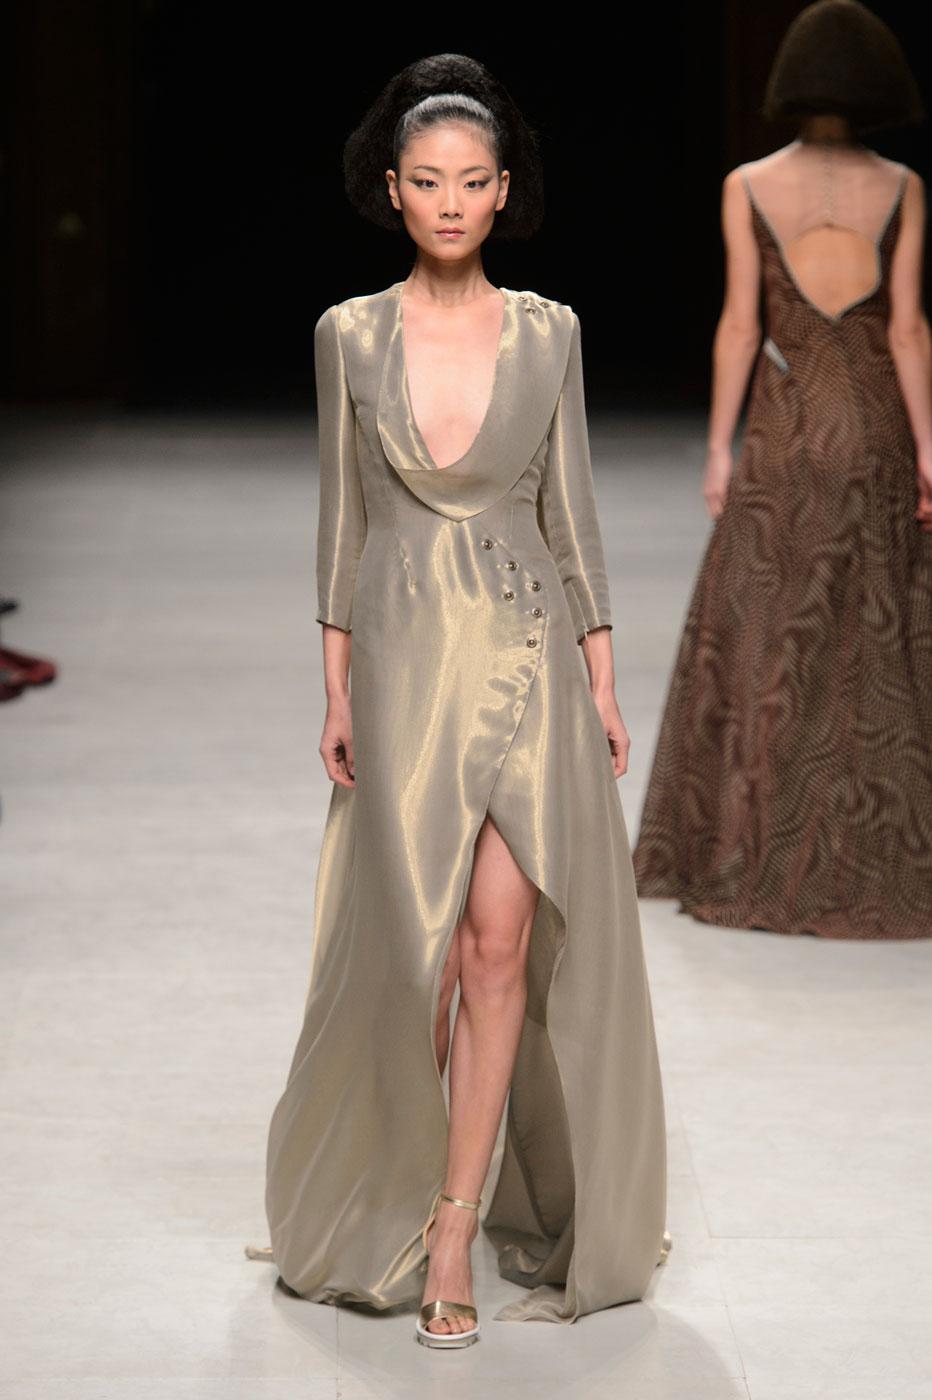 Julien-Fournie-Prive-fashion-runway-show-haute-couture-paris-spring-2015-the-impression-42